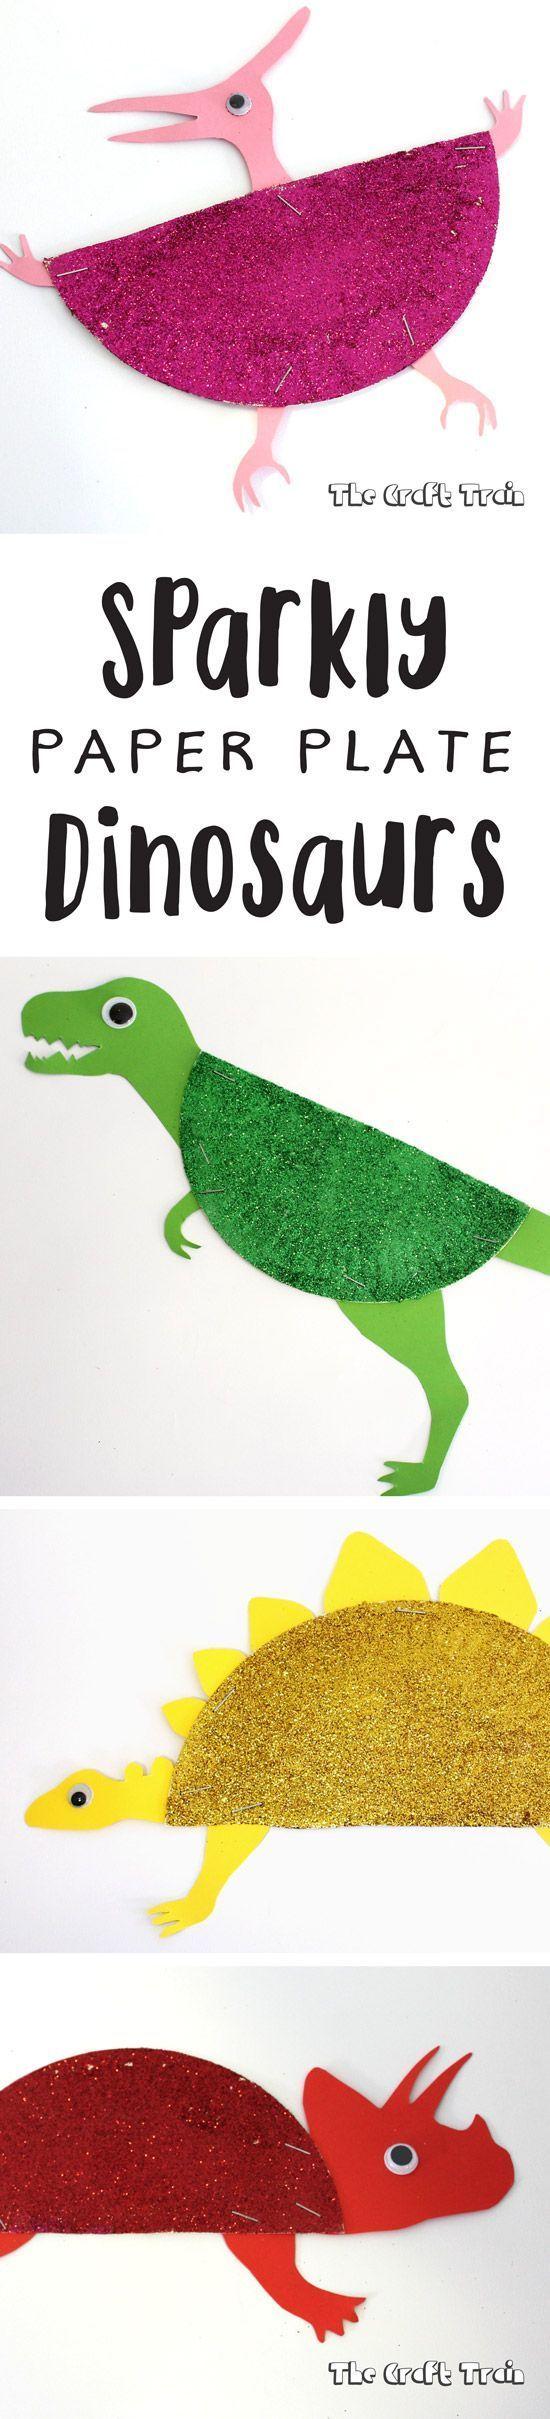 346 best Dinosaurs images on Pinterest | Dinosaur party, Dinosaurs ...